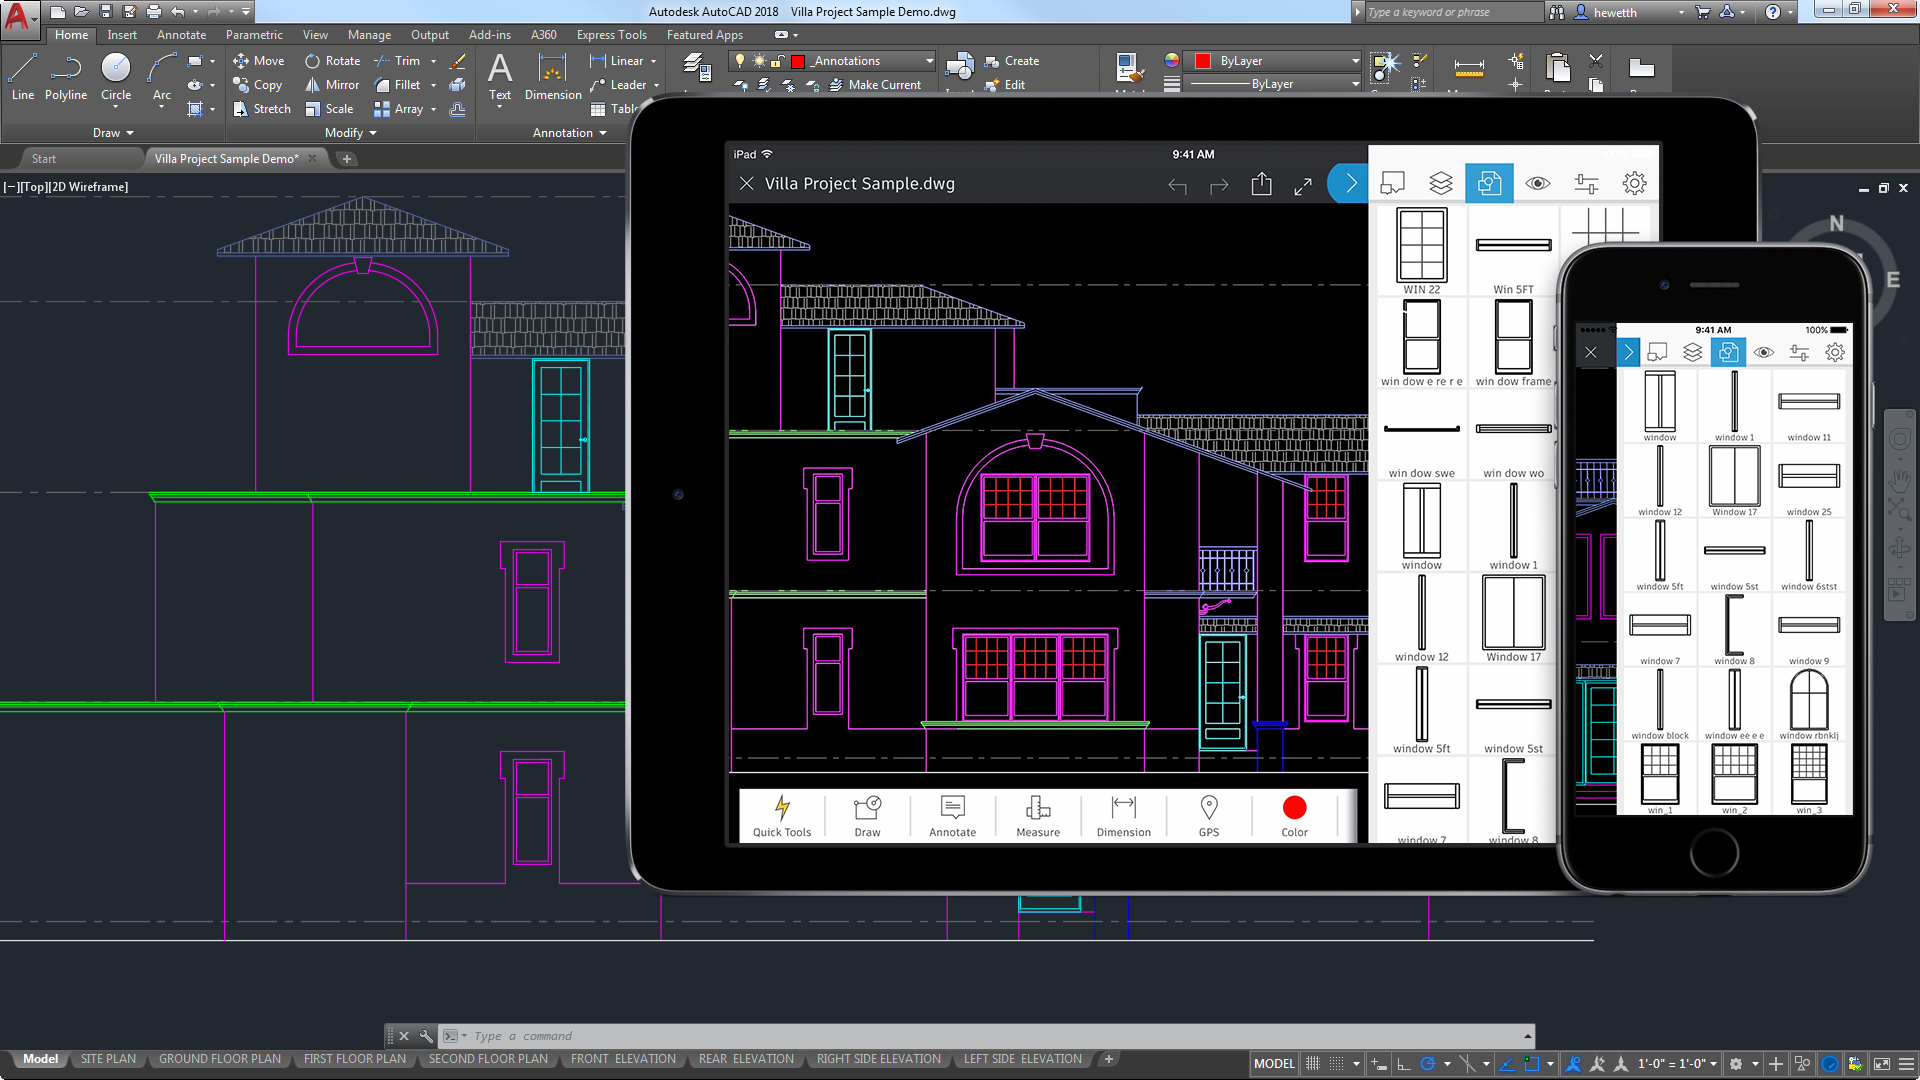 Autodesk Autocad per windows e mac